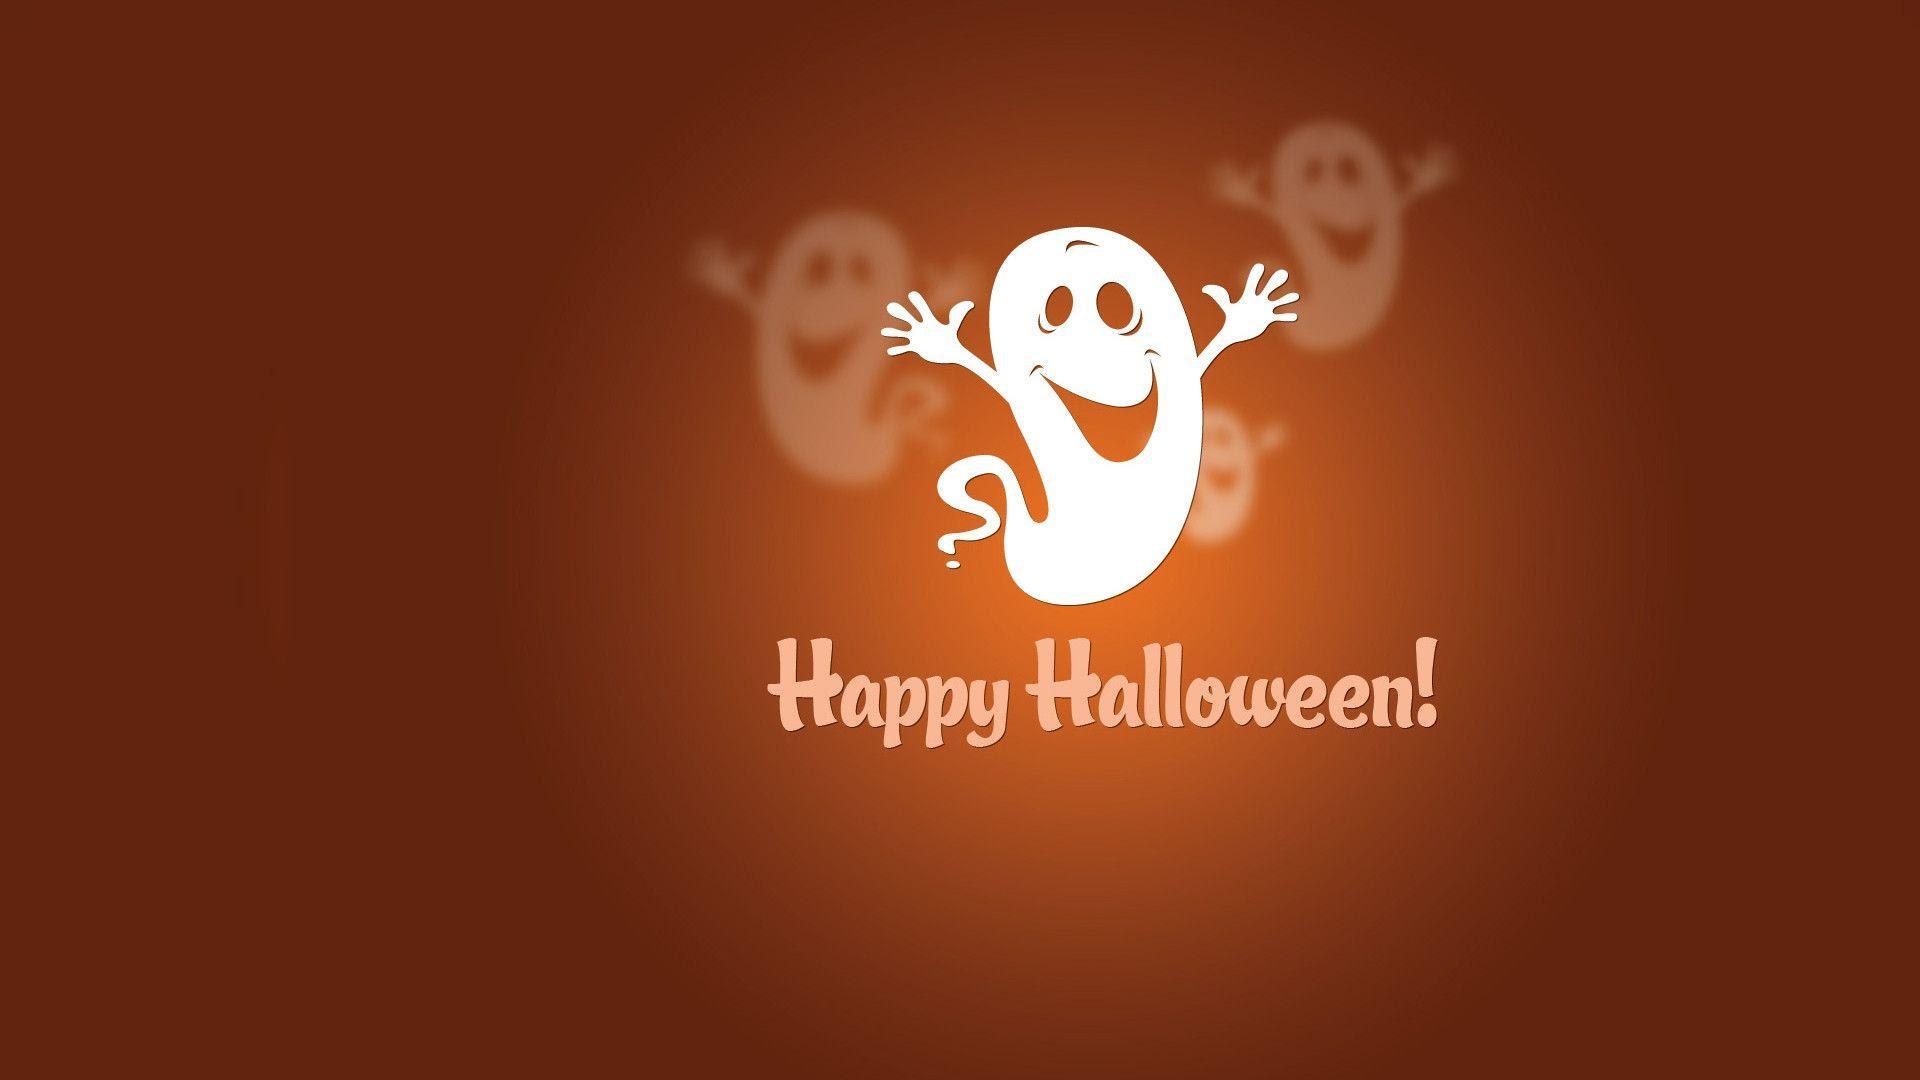 Cute Halloween Desktop Wallpapers  Wallpaper Cave